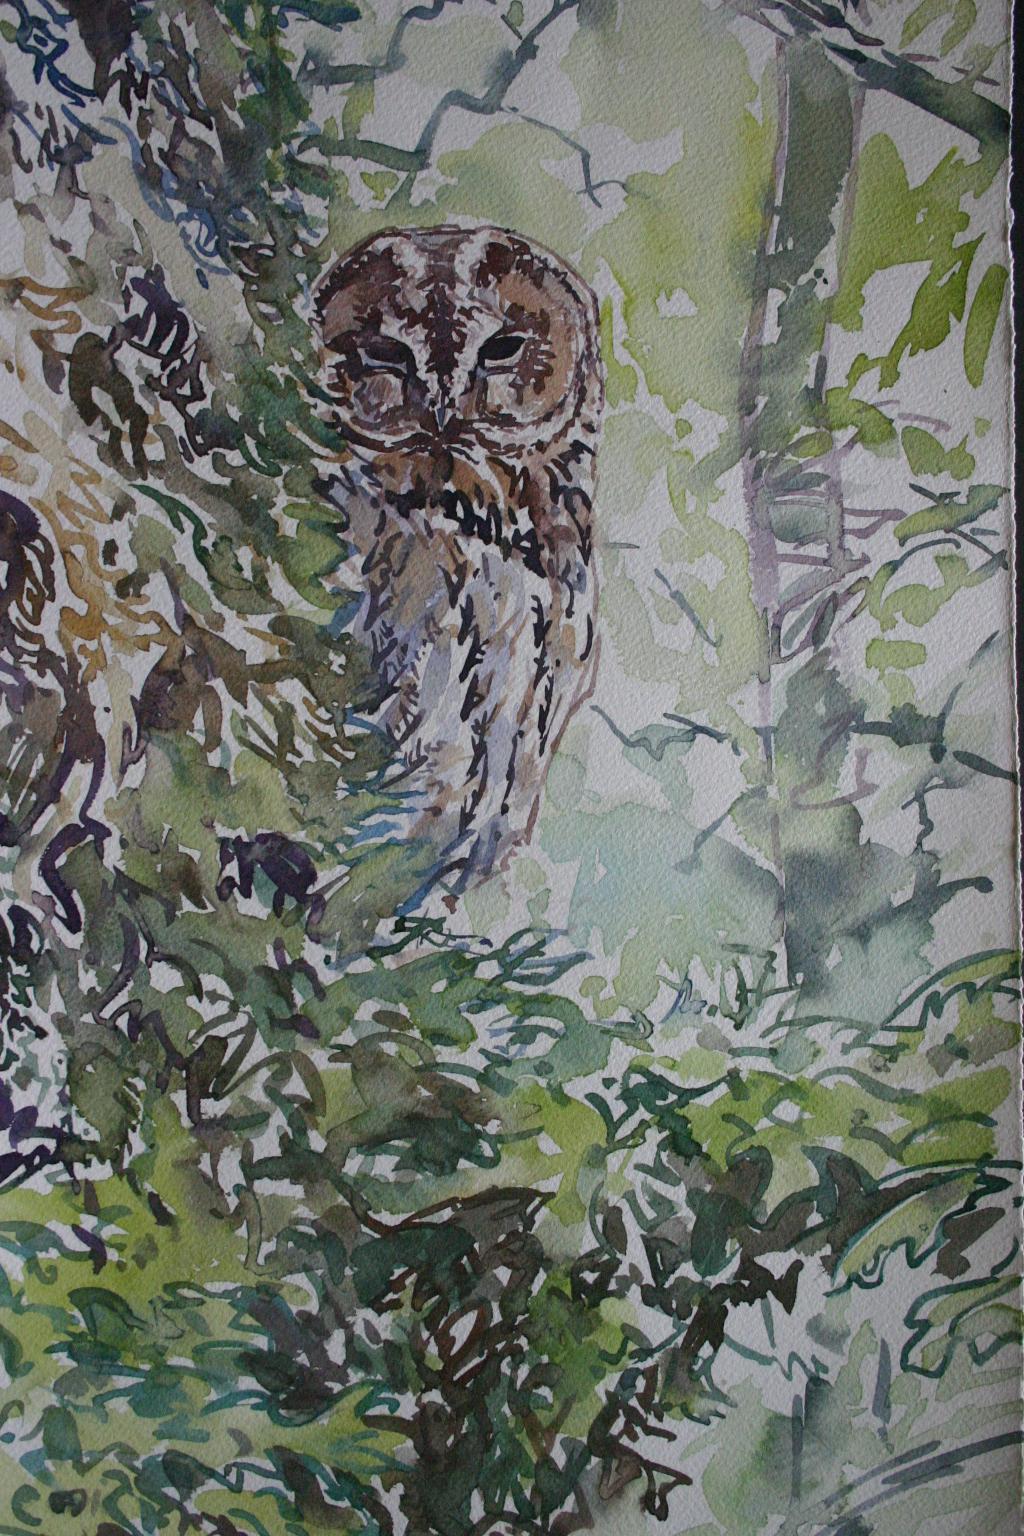 Roosting Tawny Owl